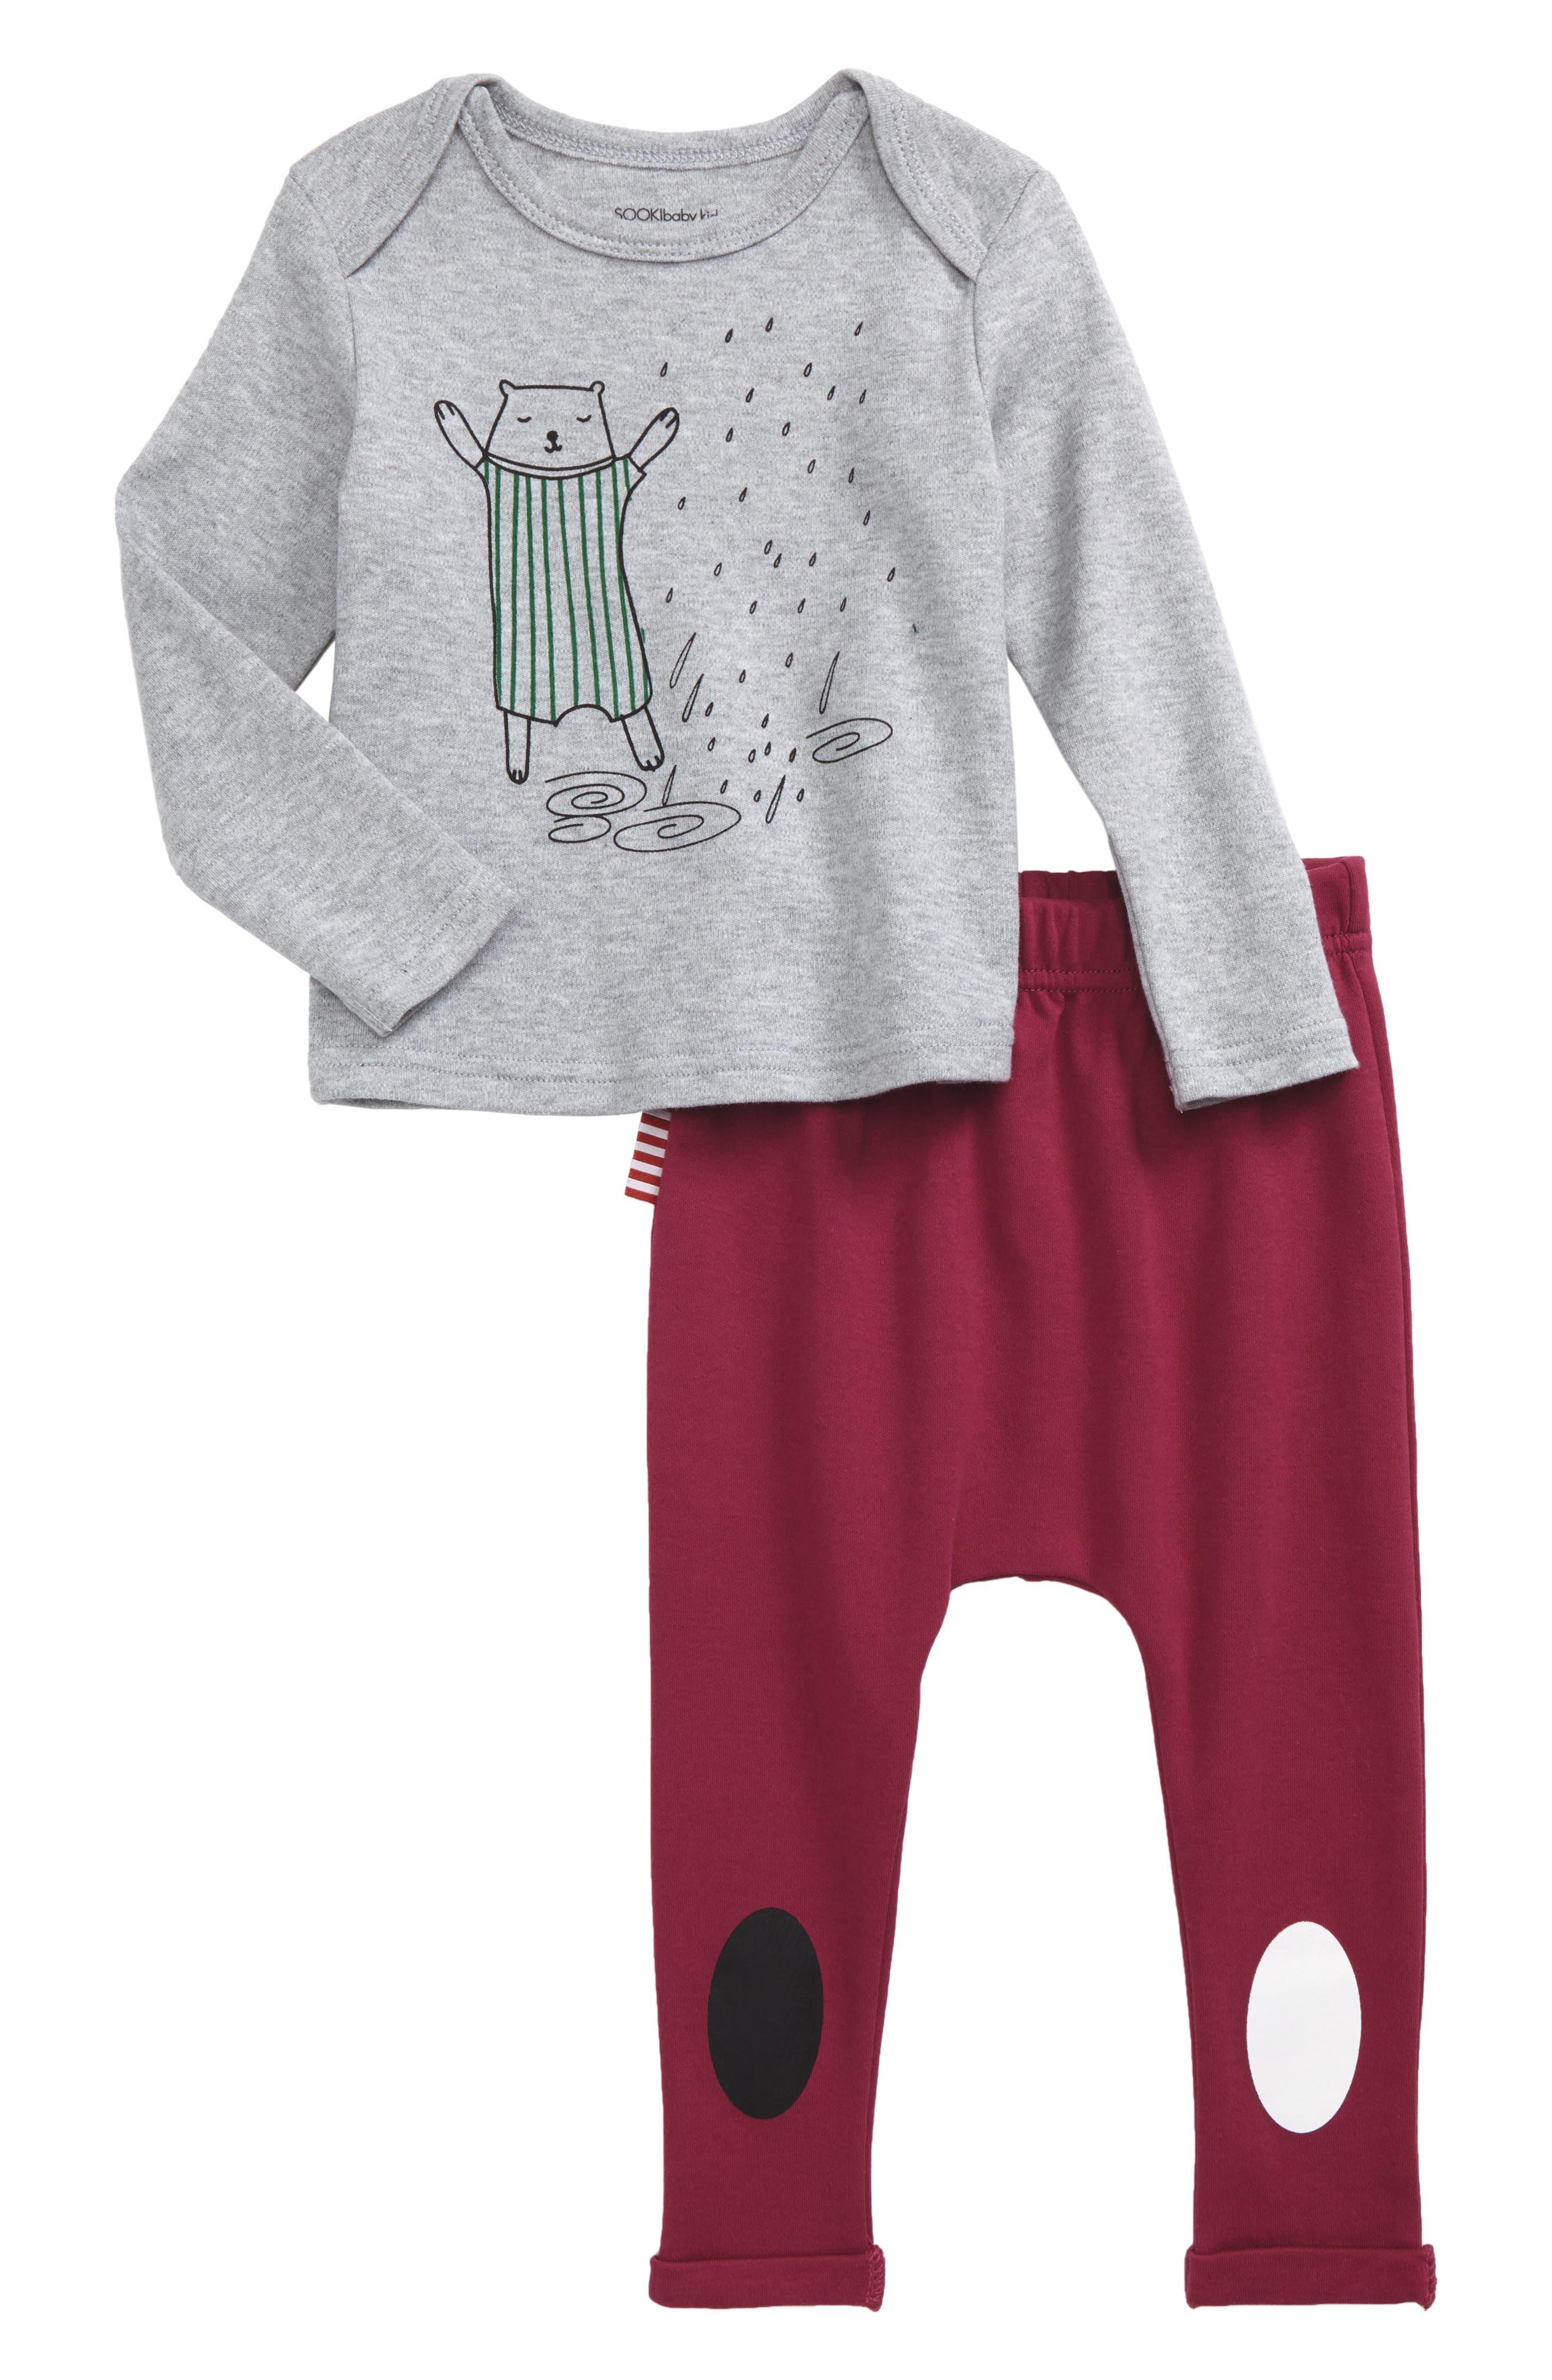 Alternate Image 1 Selected - SOOKIbaby Christmas T-Shirt & Pants Set (Baby)